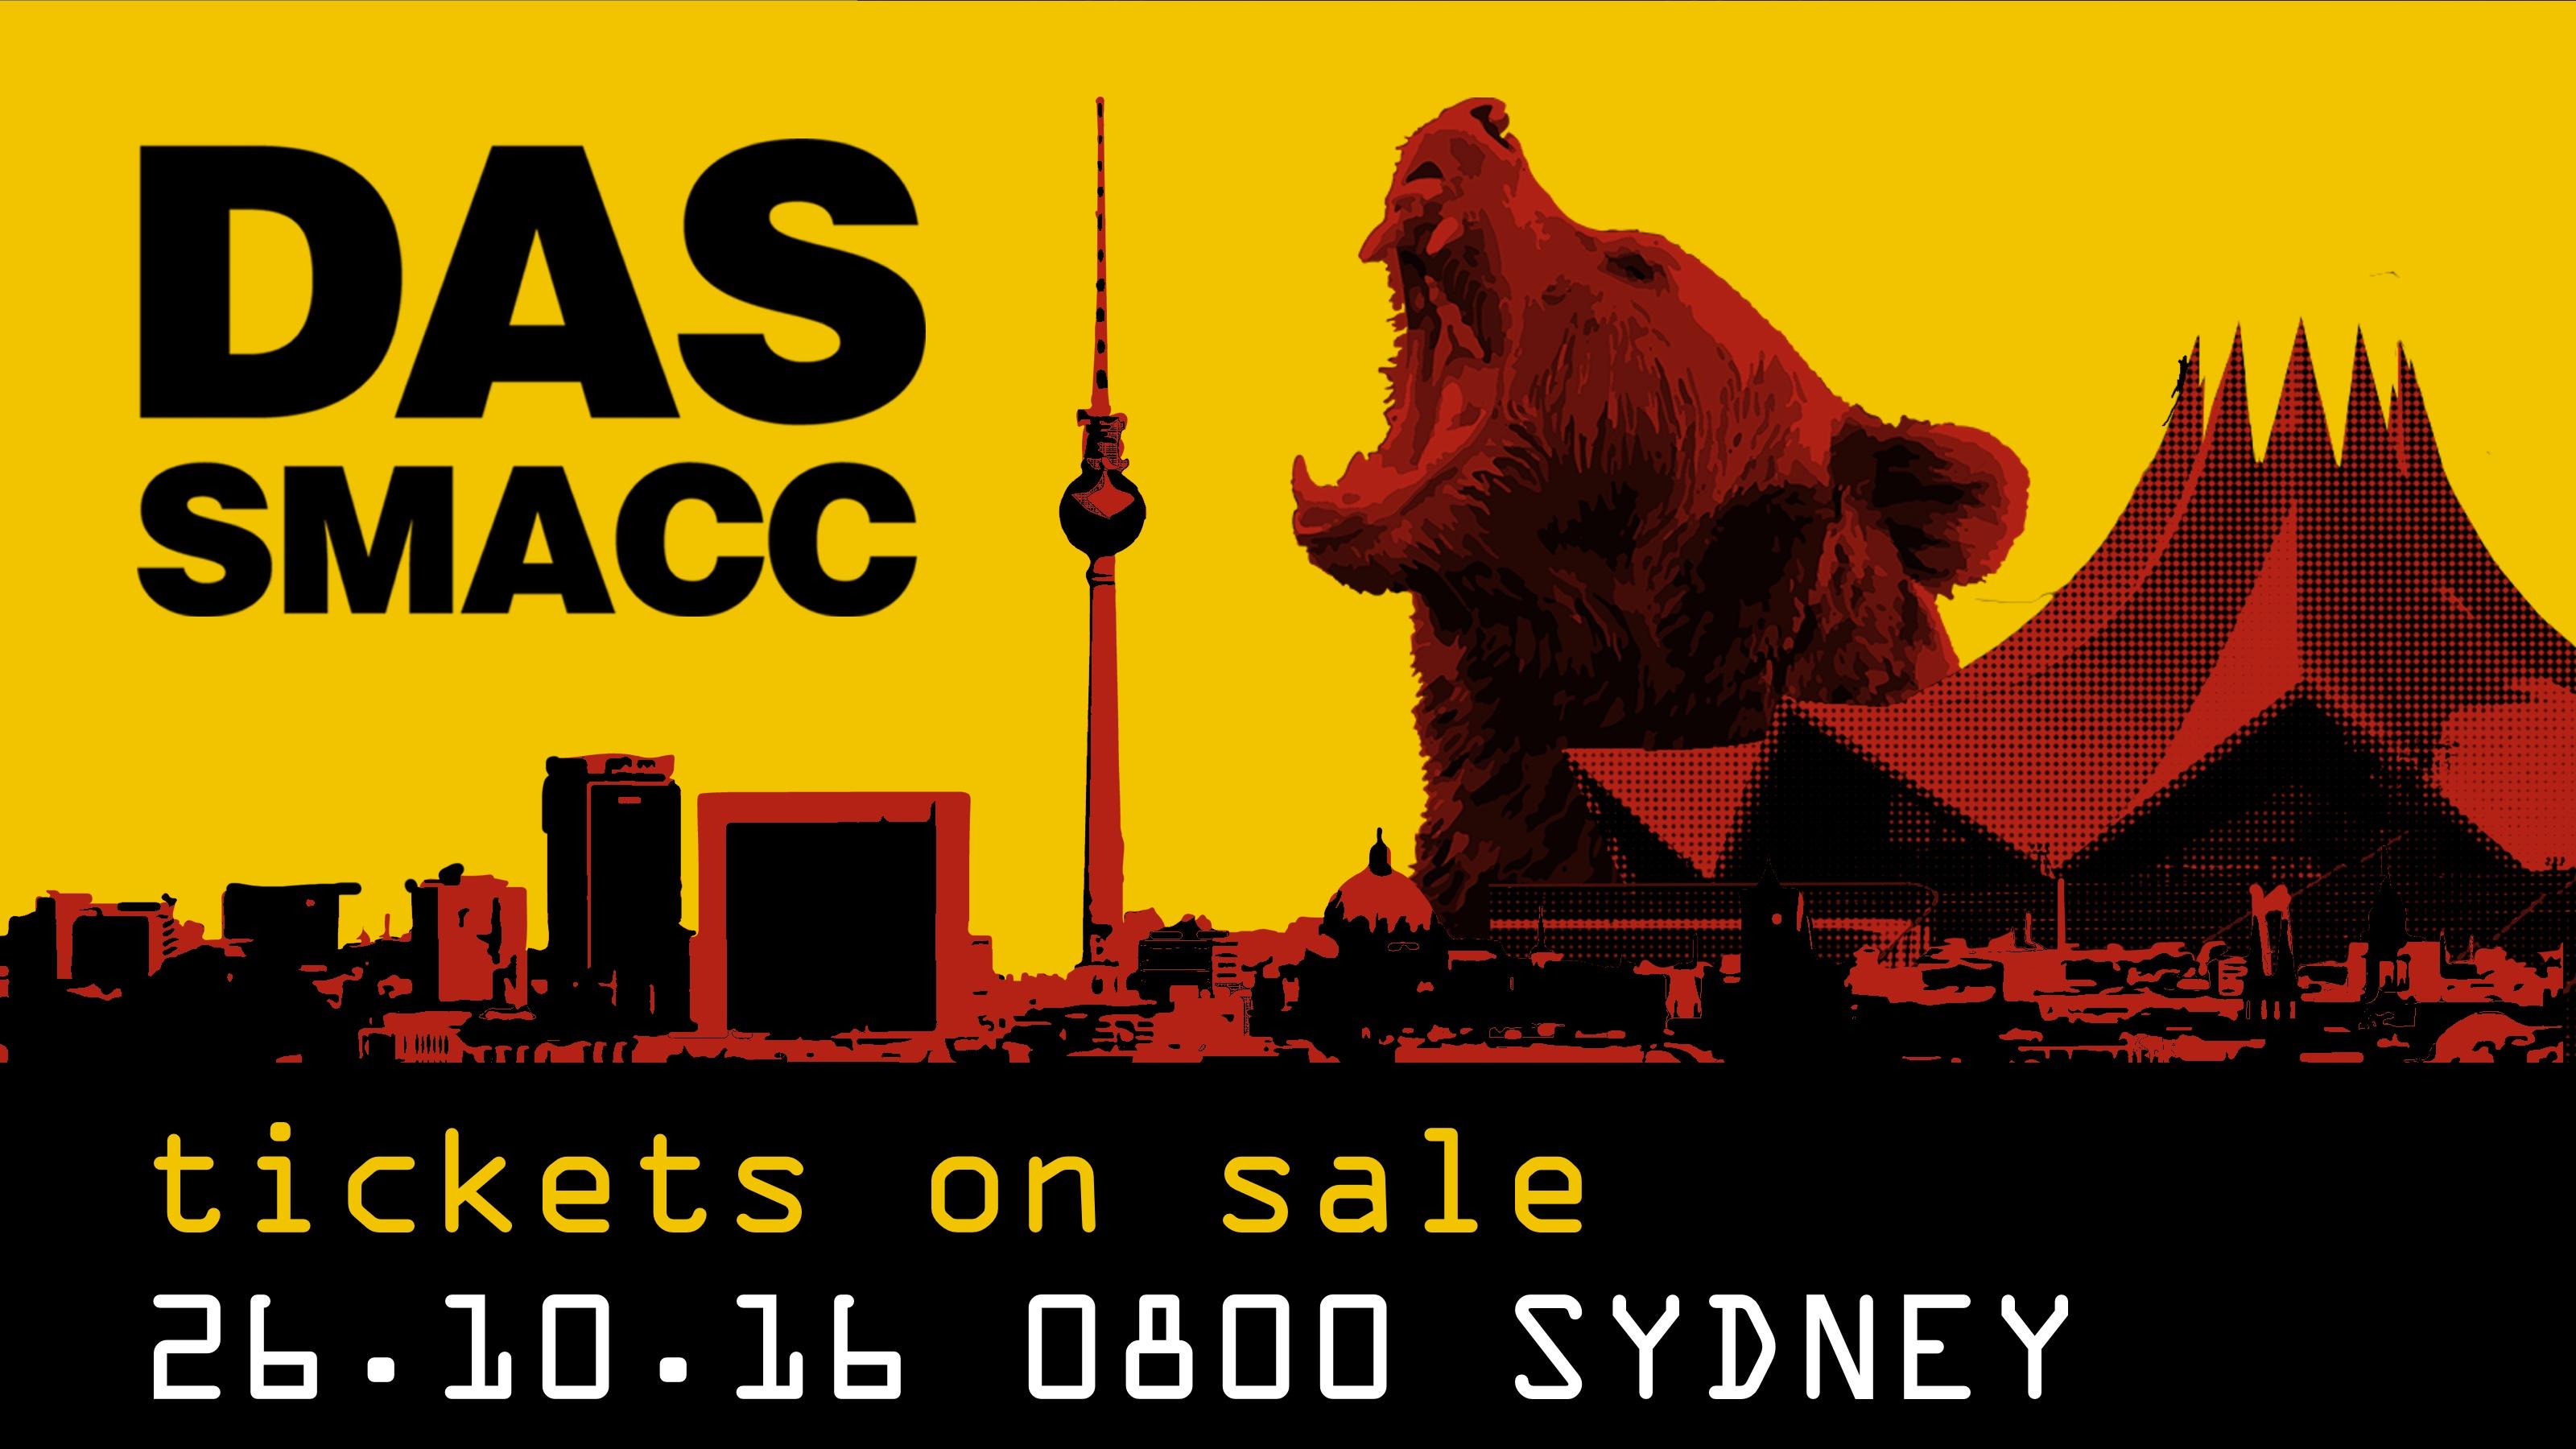 das-smacc-ticket-syd-release-26-10-16